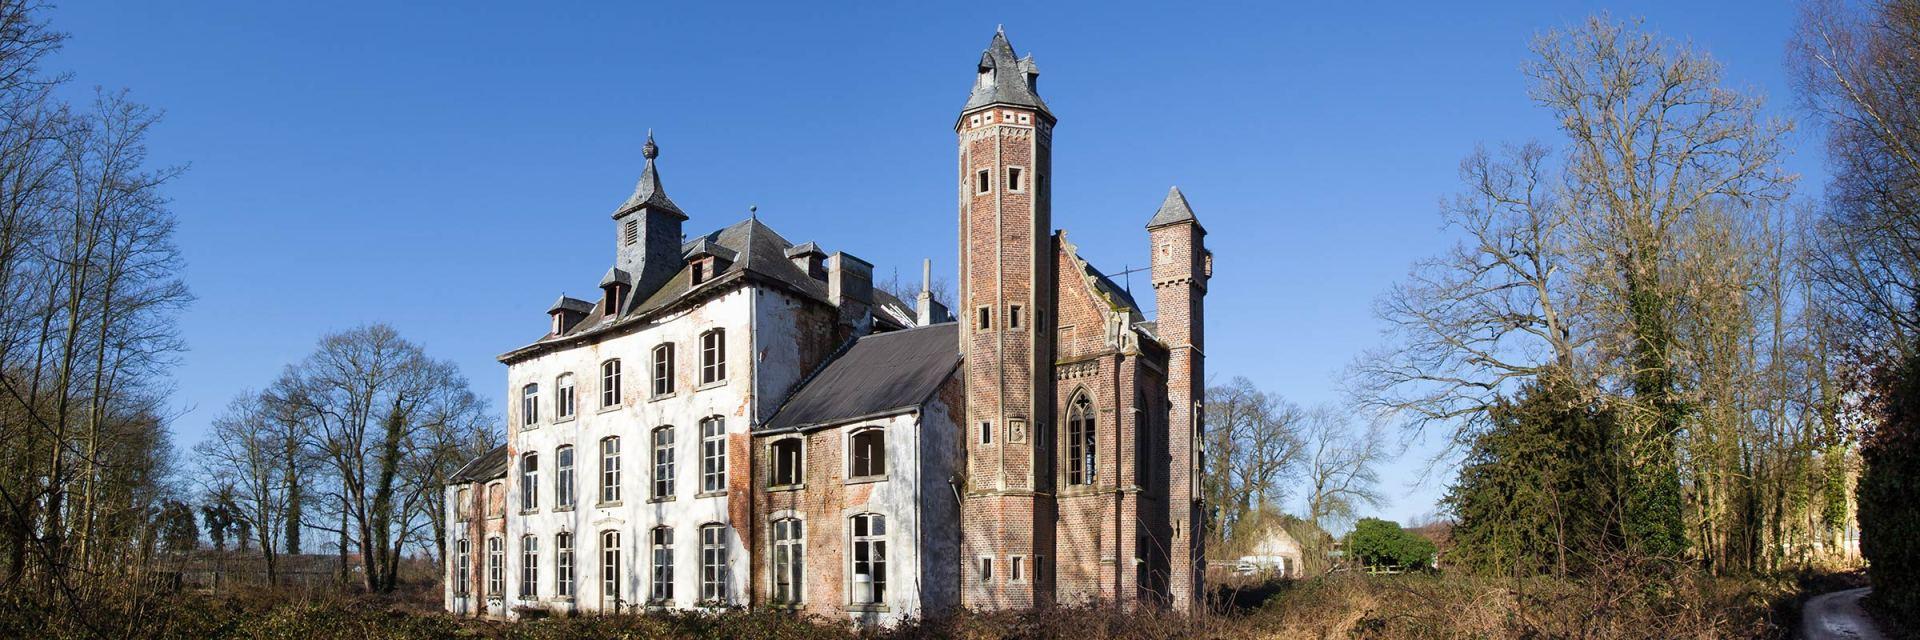 chateau-hogemeijer-belgium-urbex-locatie